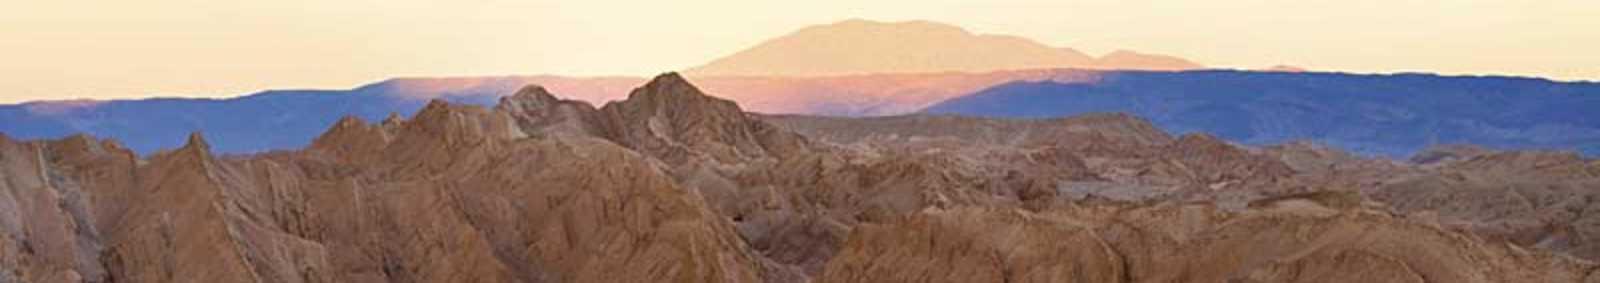 The Valley of Moon at sunrise, San Pedro de Atacama, Chile